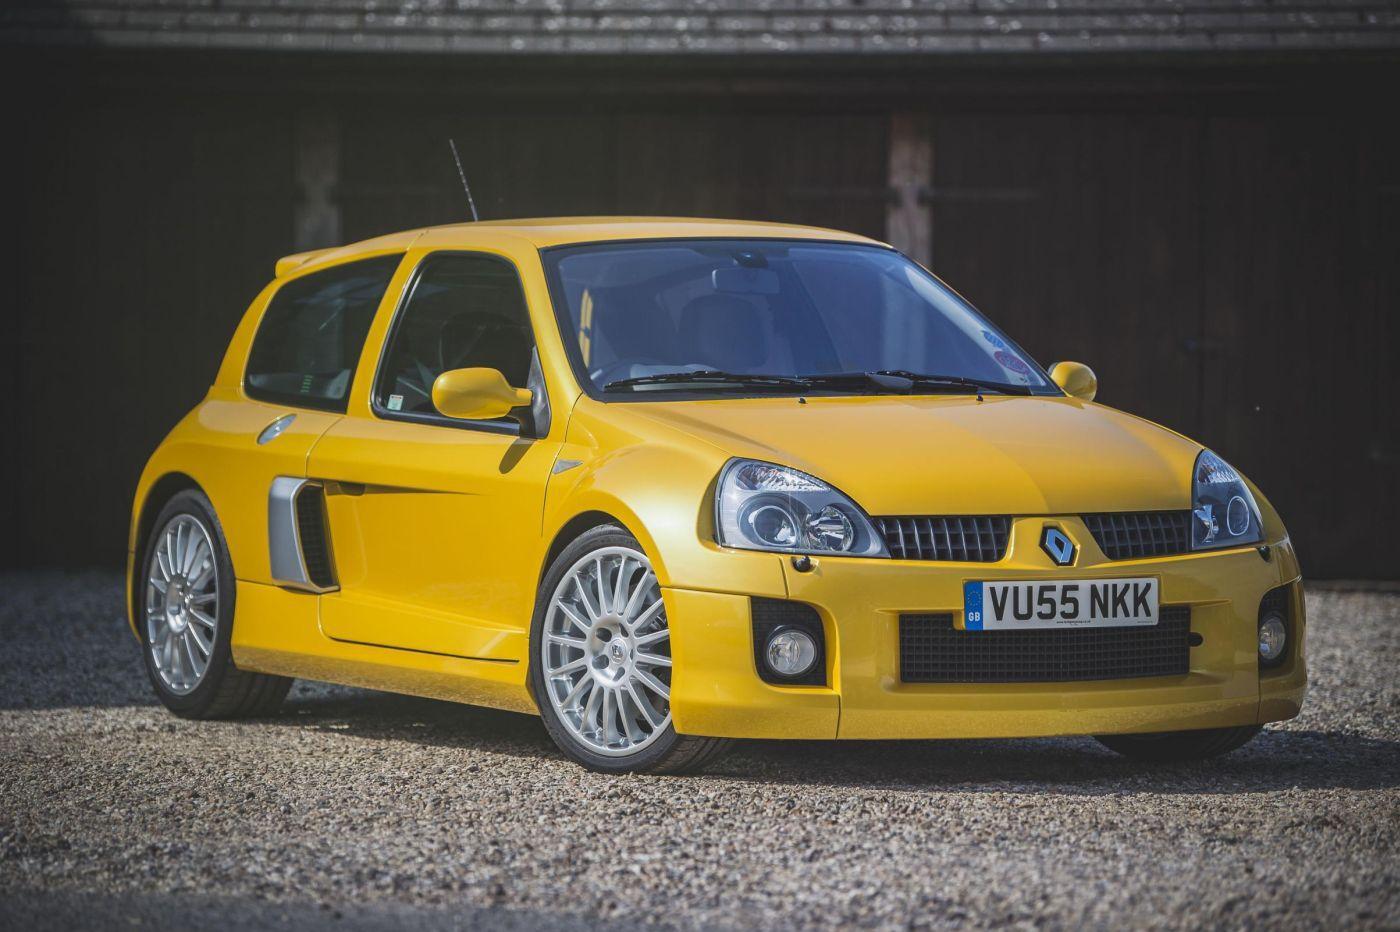 Renault Clio V Phase